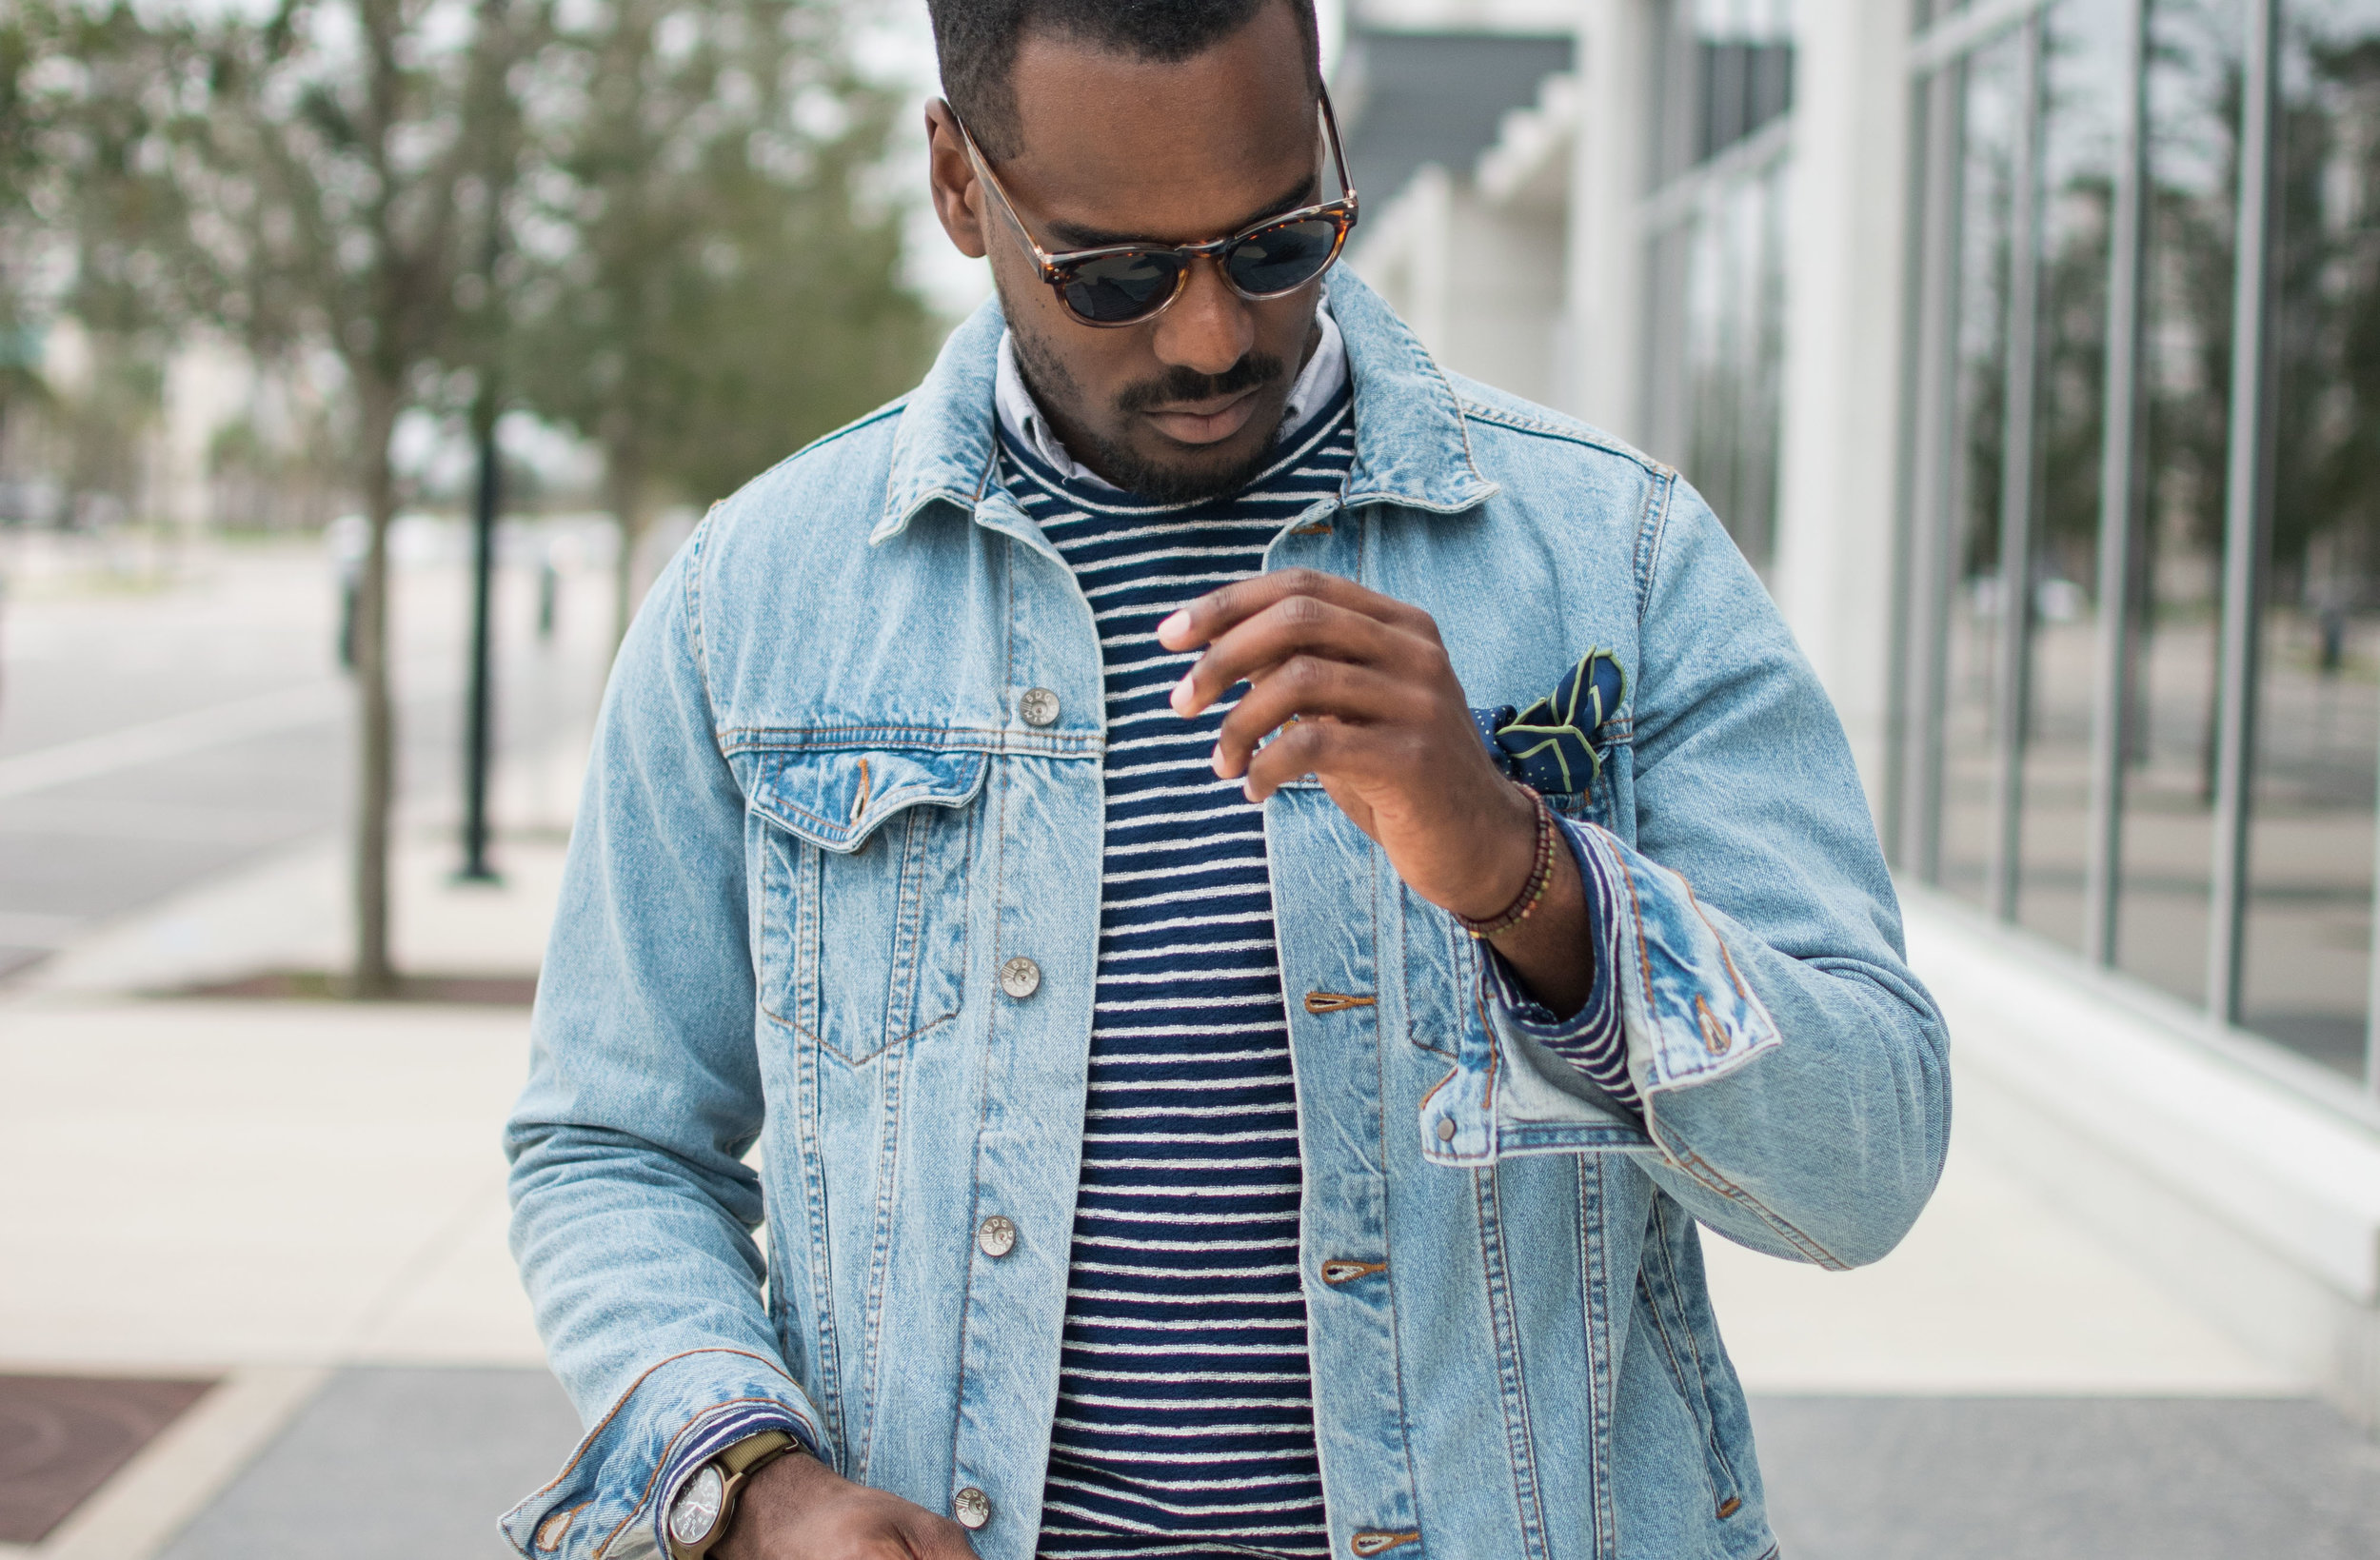 denim jacket style mens